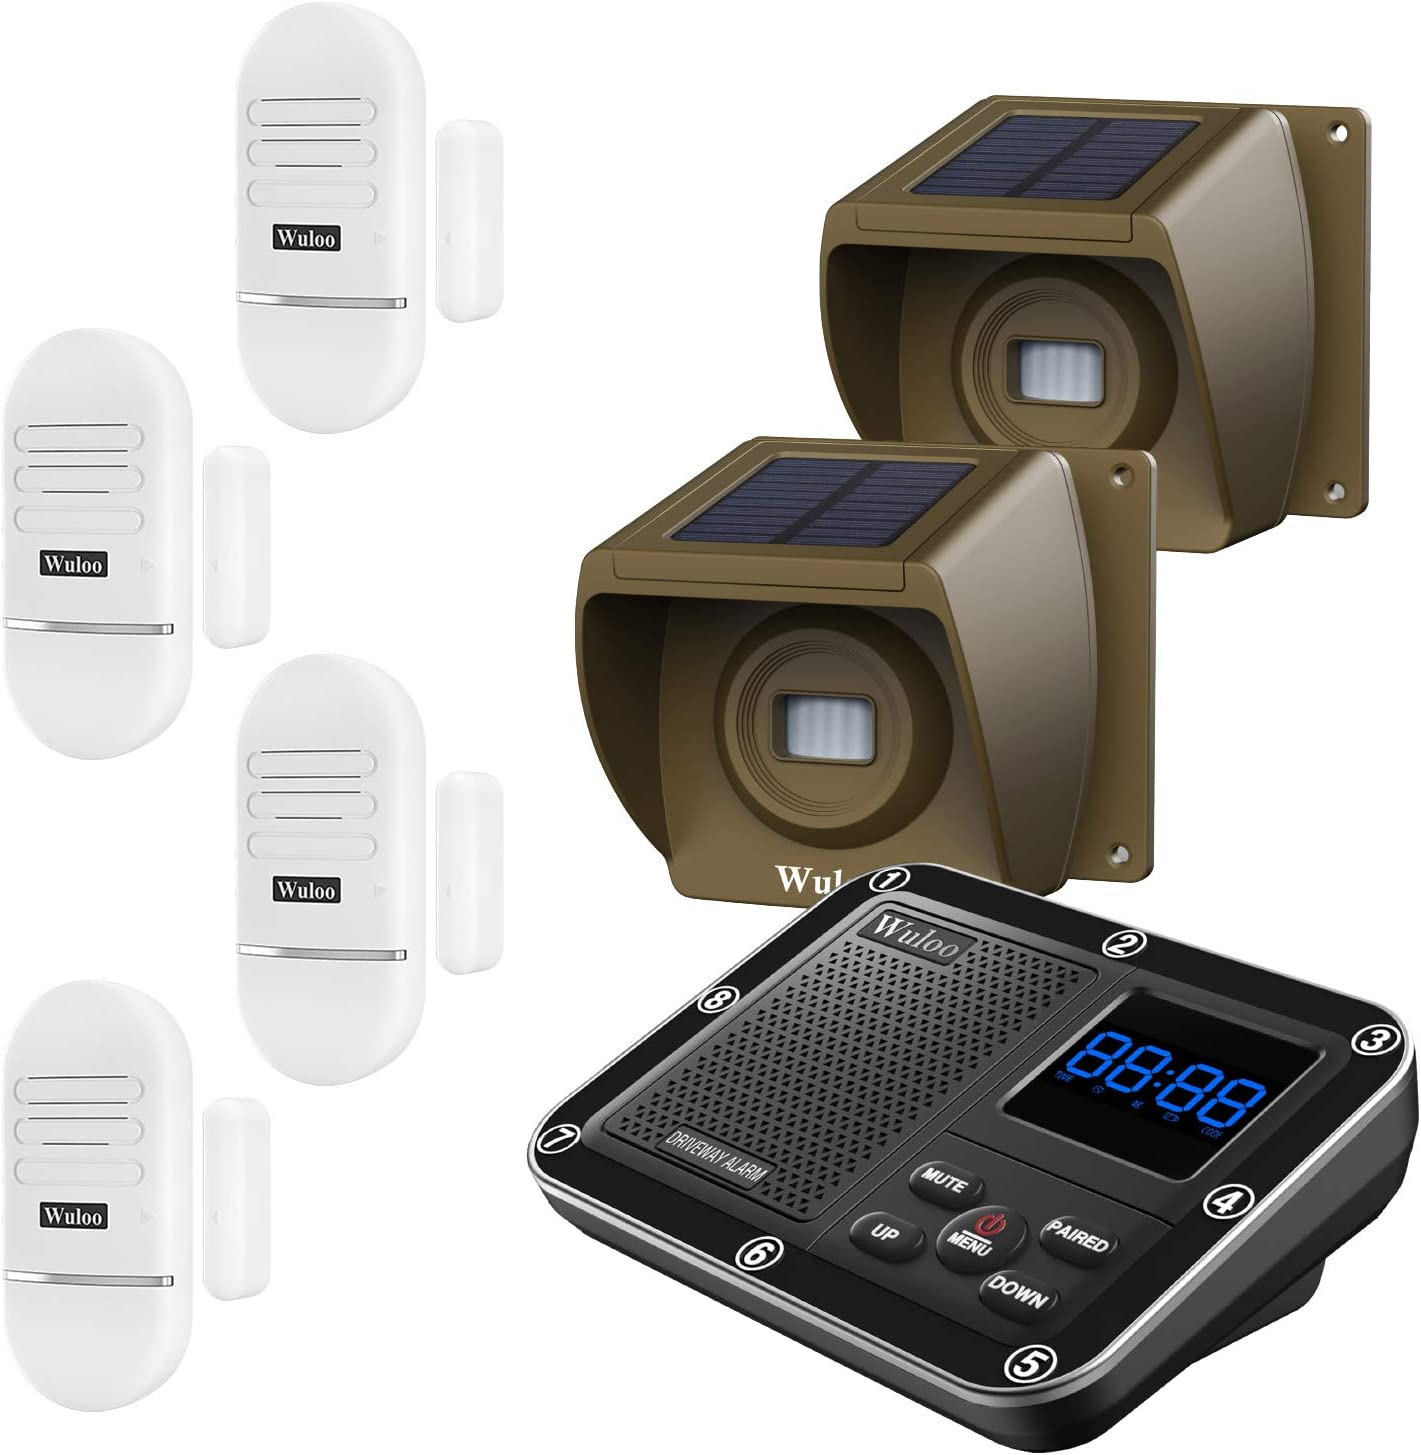 Door Window Alarm for Home, Solar Driveway Alarm Alert, Multifunctional 7 Piece Wireless Home Security System, Rechargeable Battery/Weatherproof/Mute Mode/Clock and Alarm